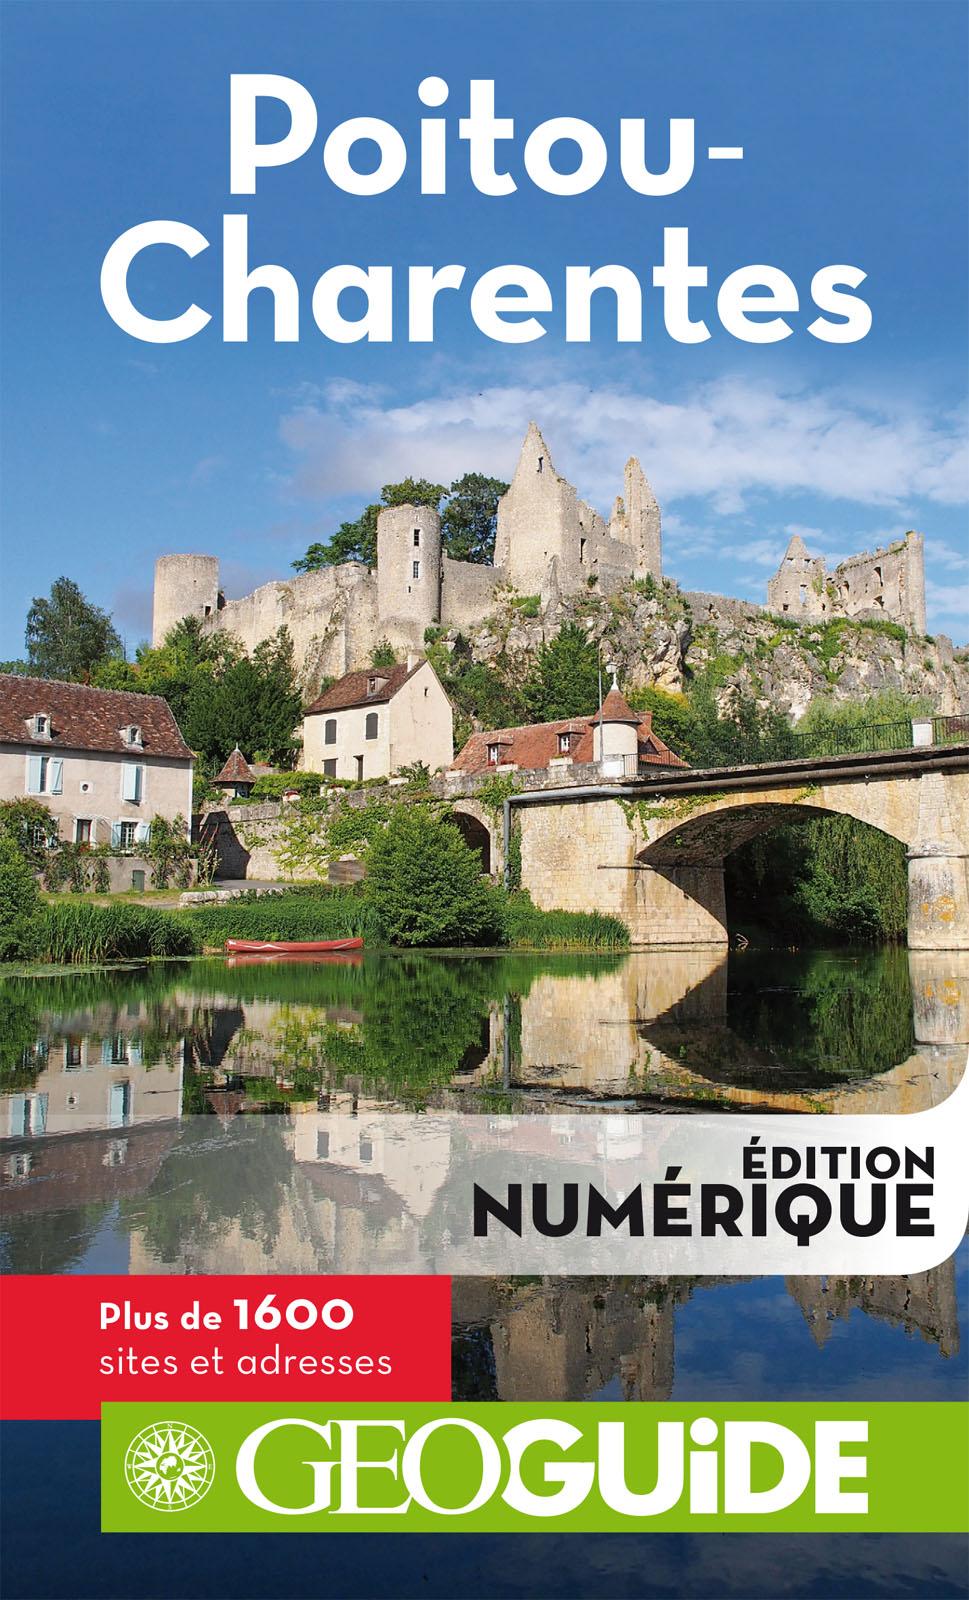 GEOguide Poitou-Charentes